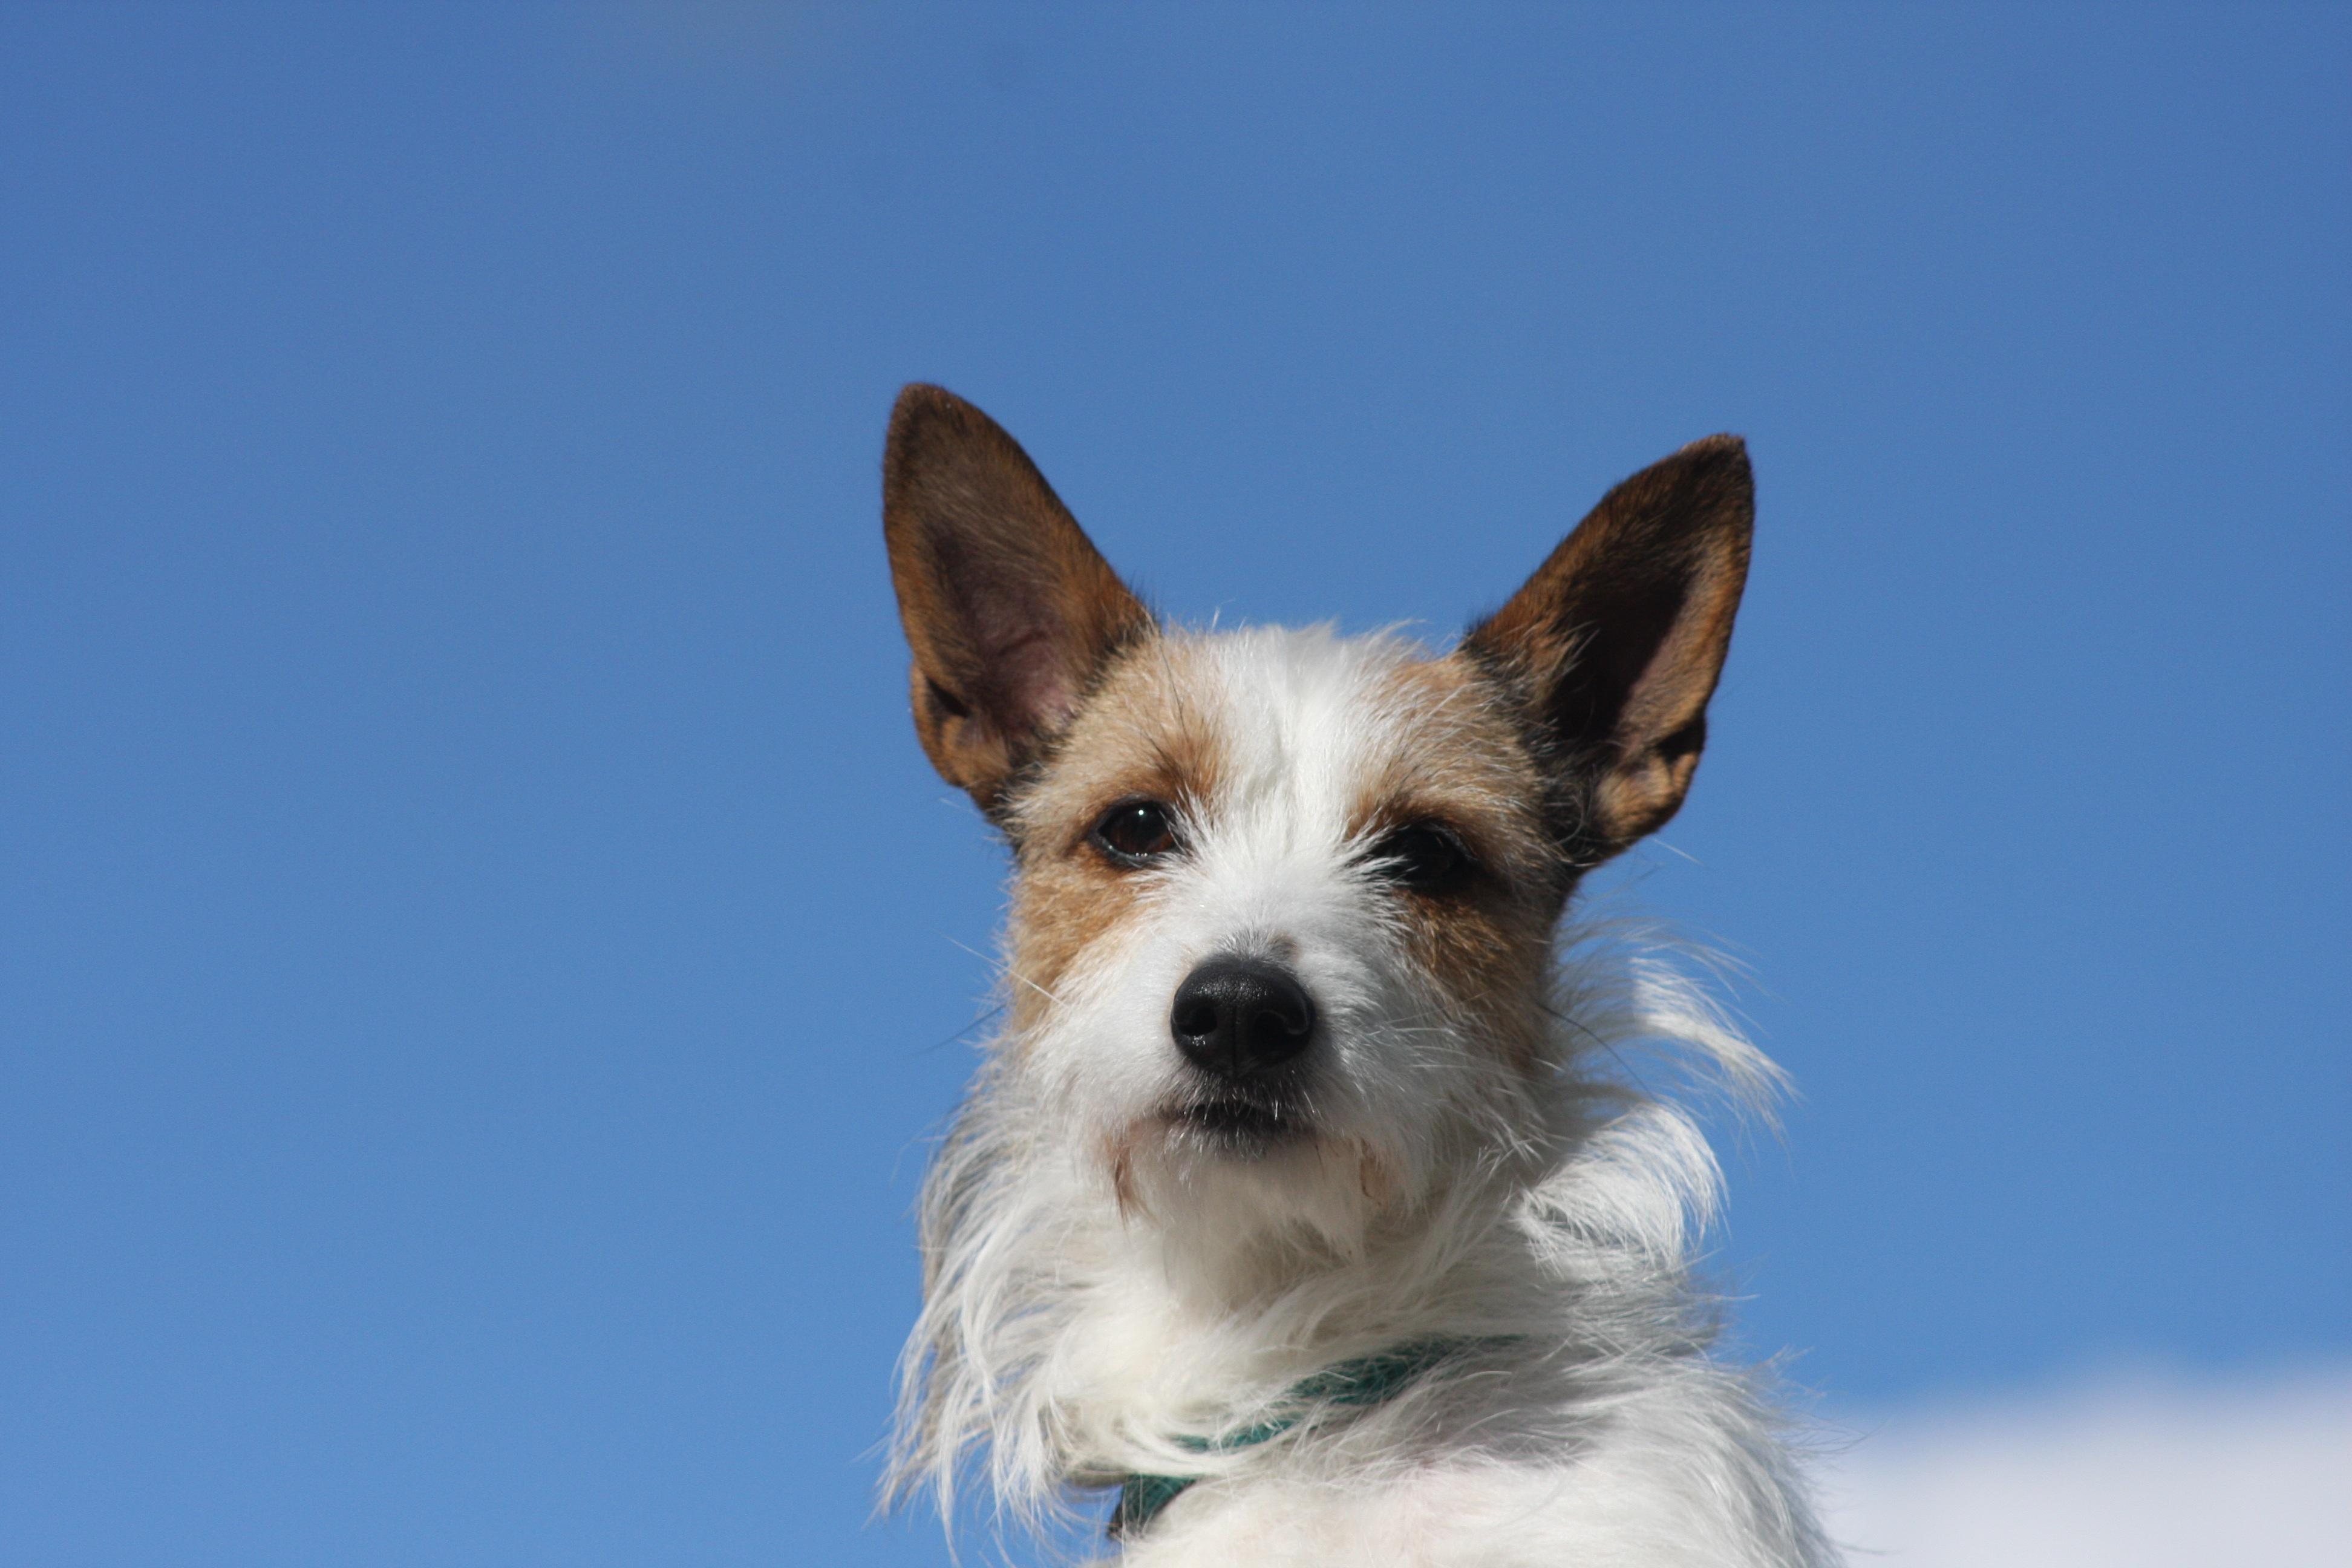 Free Images : nature, animal, blue sky, pets, vertebrate, dog breed ...